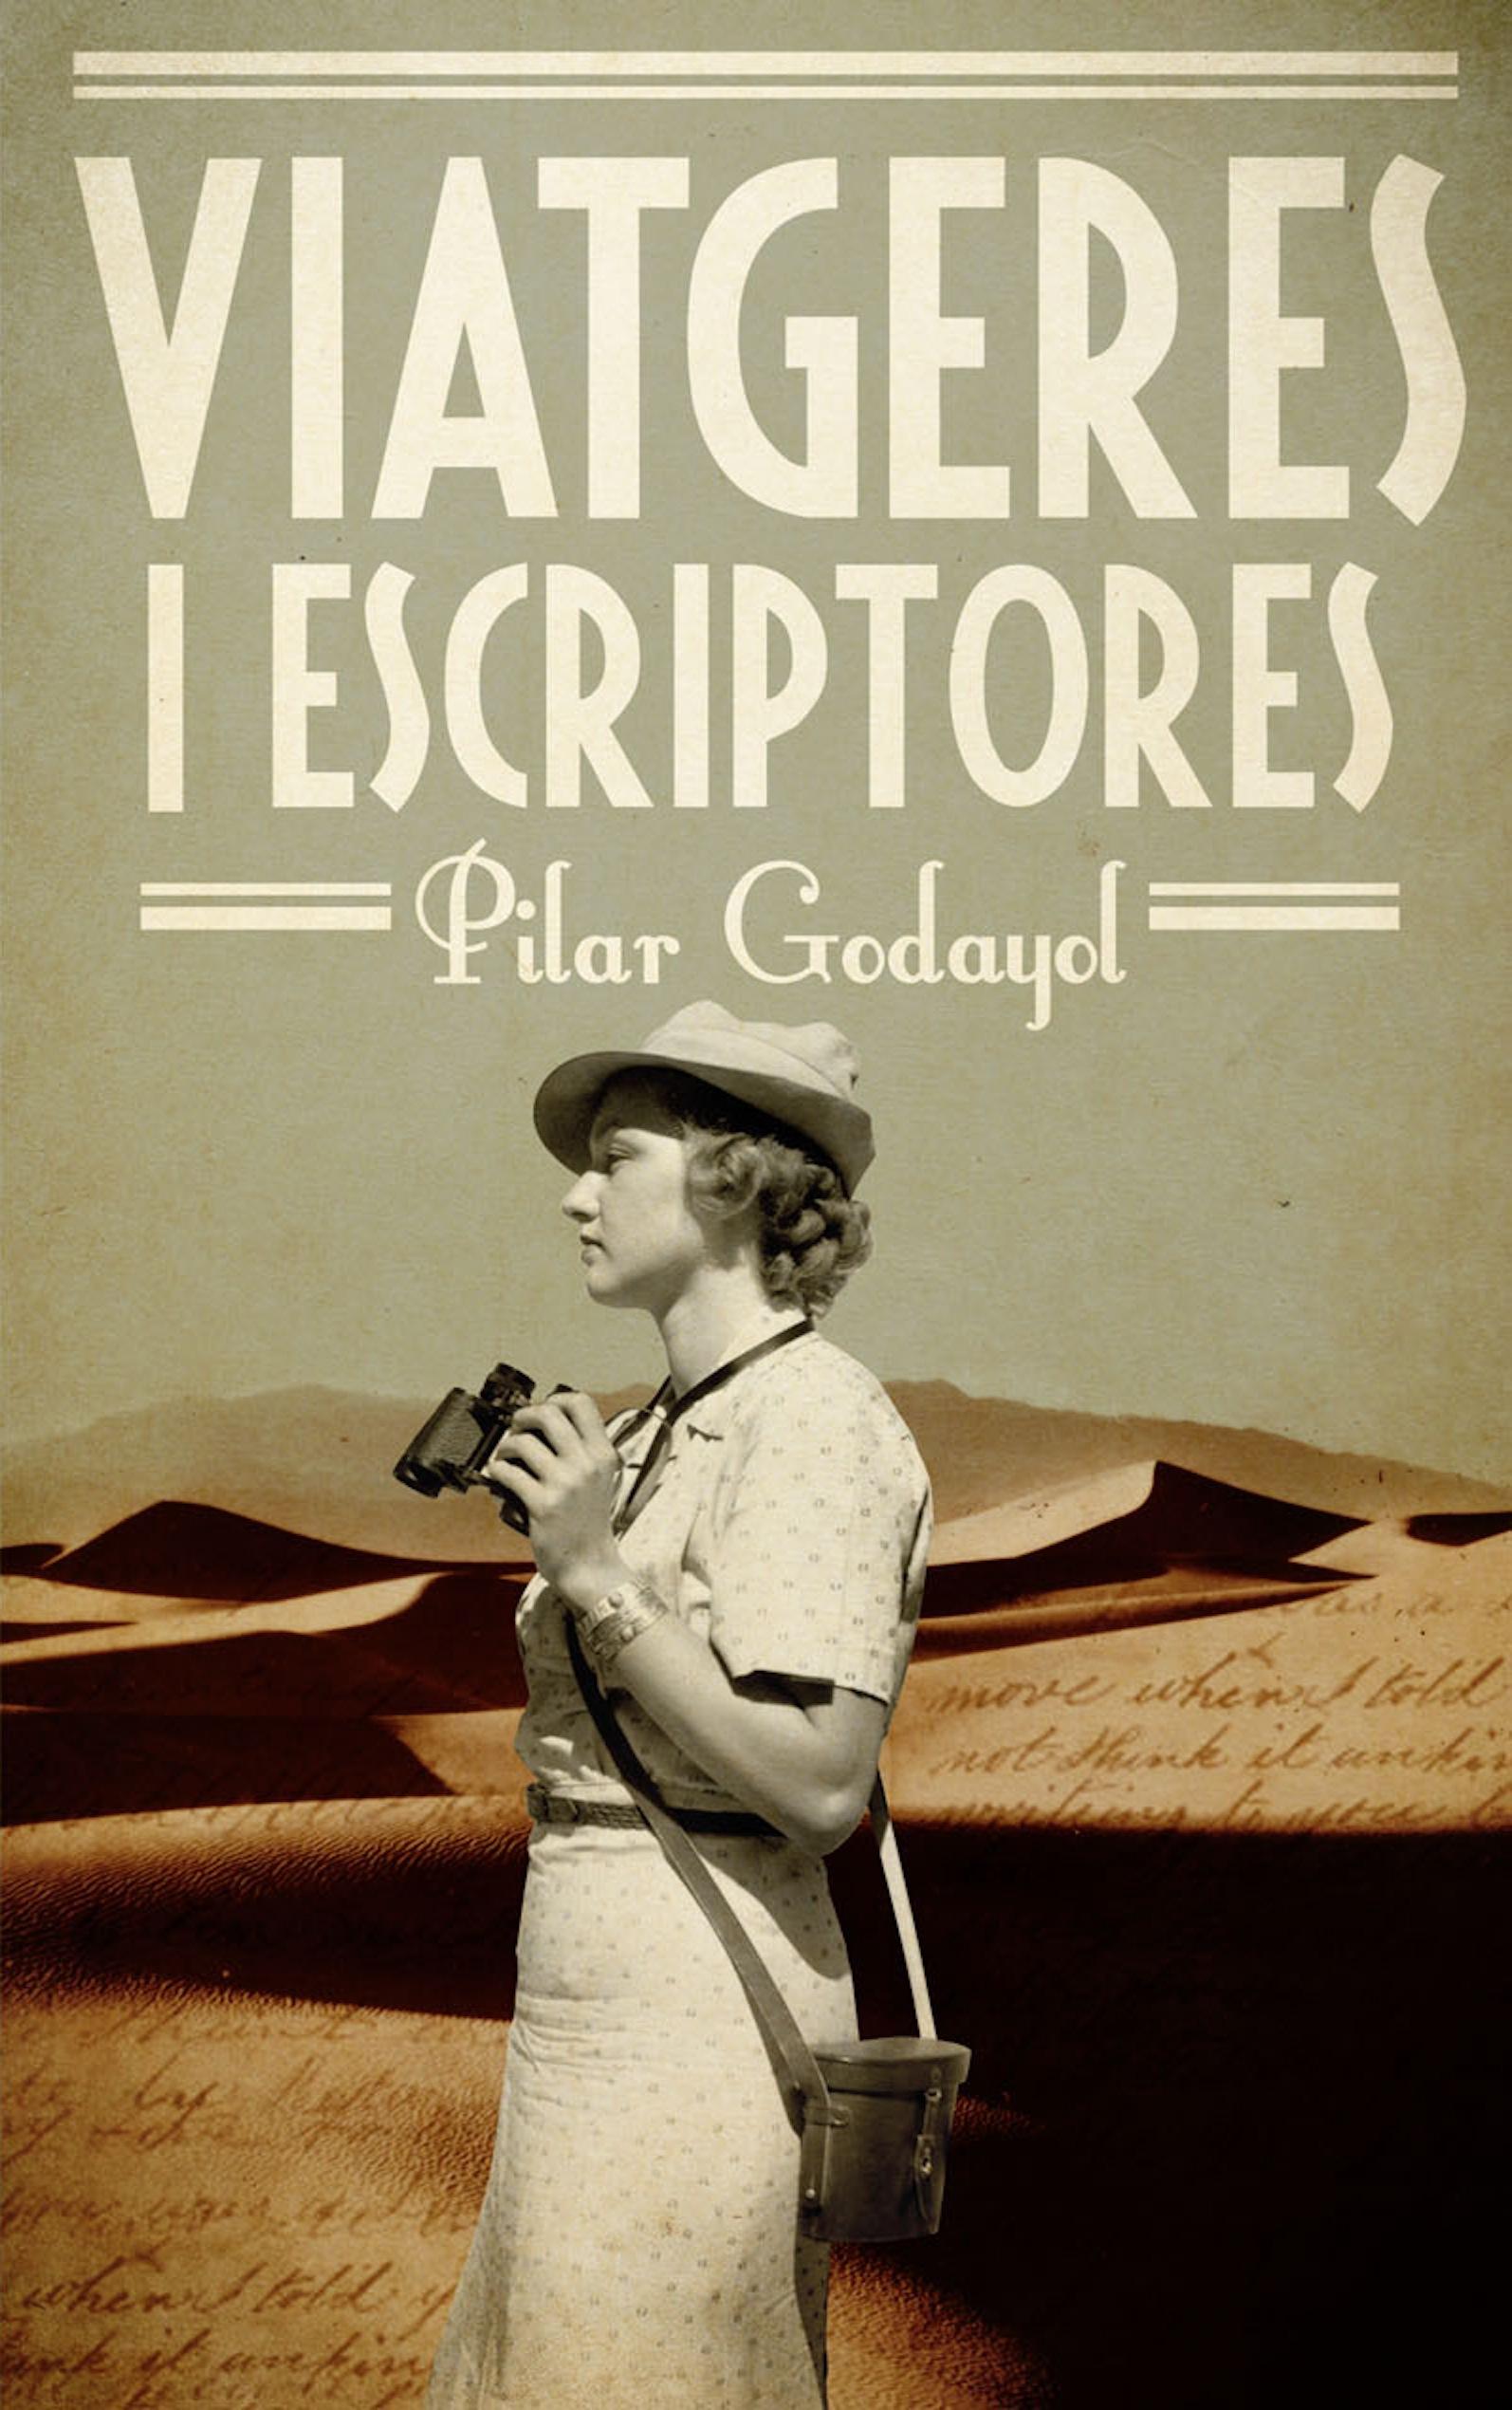 Maria Pilar Godayol Nogué Viatgeres i escriptores alzugaray pilar barrios maria jose bartolome paz preparacion dele b2 libro codigo